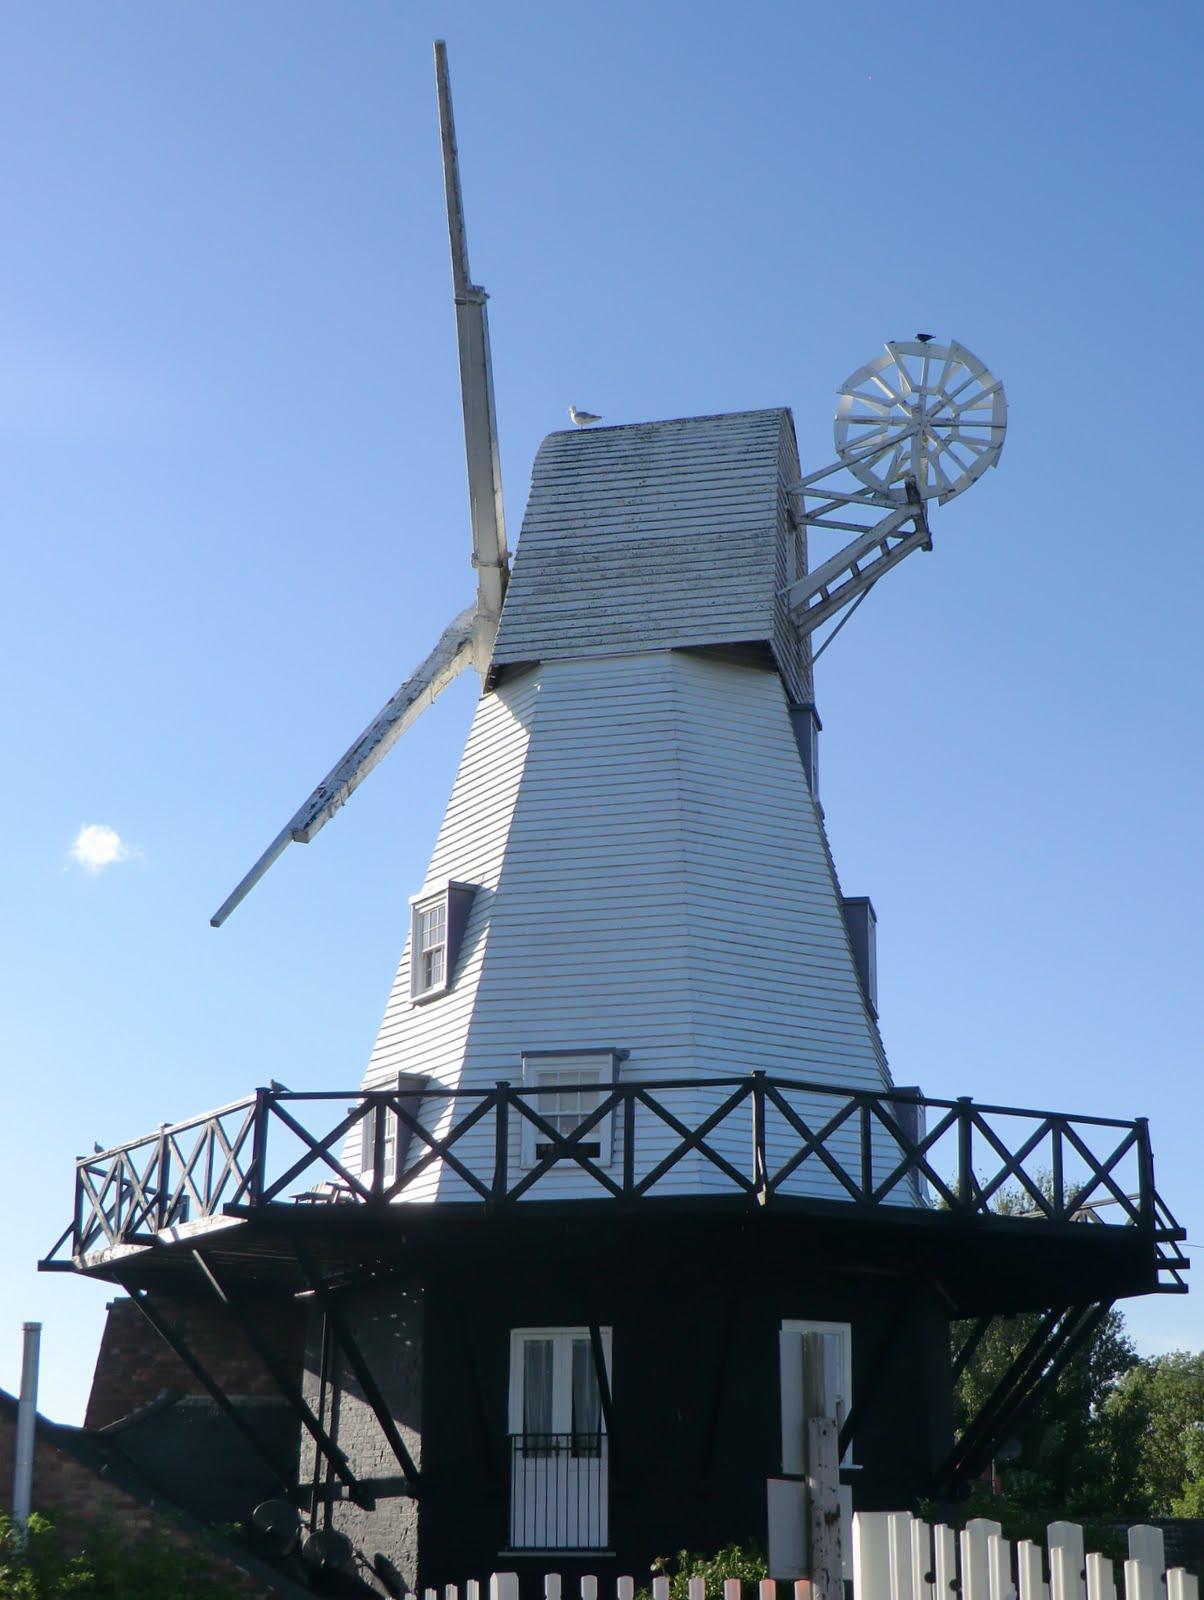 CIMG8349 Rye Windmill